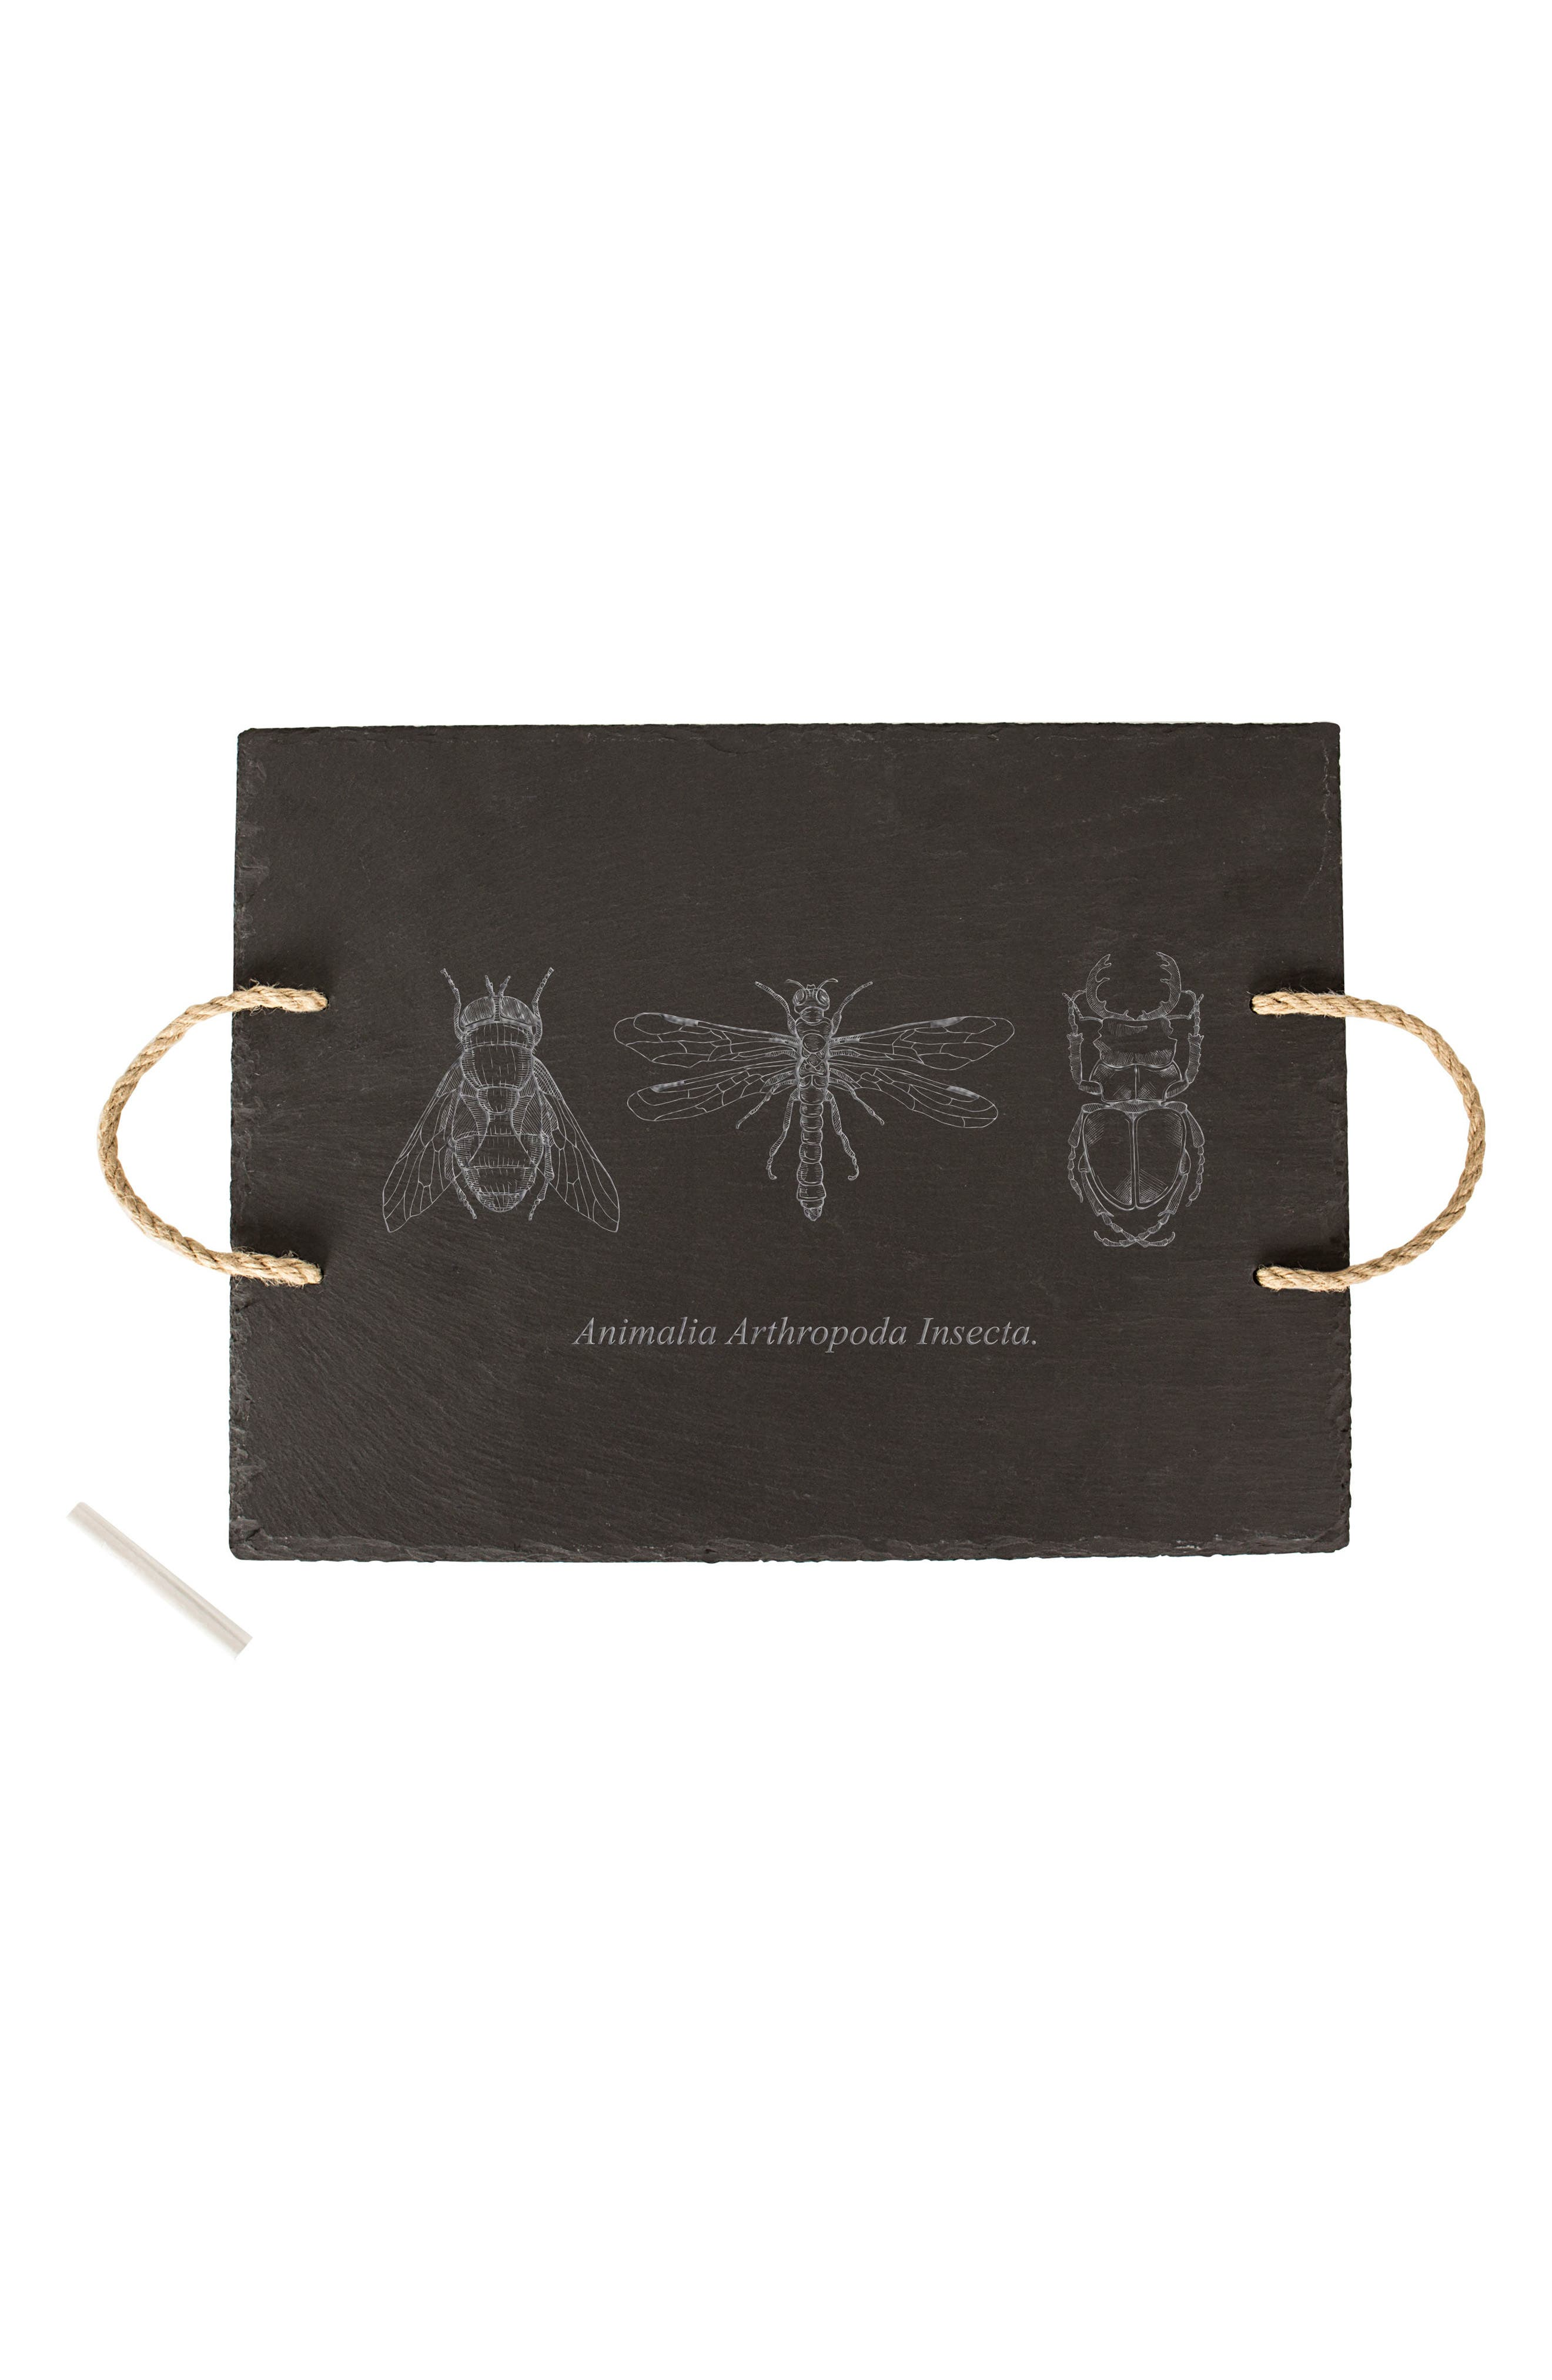 Insect Slate Tray,                             Main thumbnail 1, color,                             Black